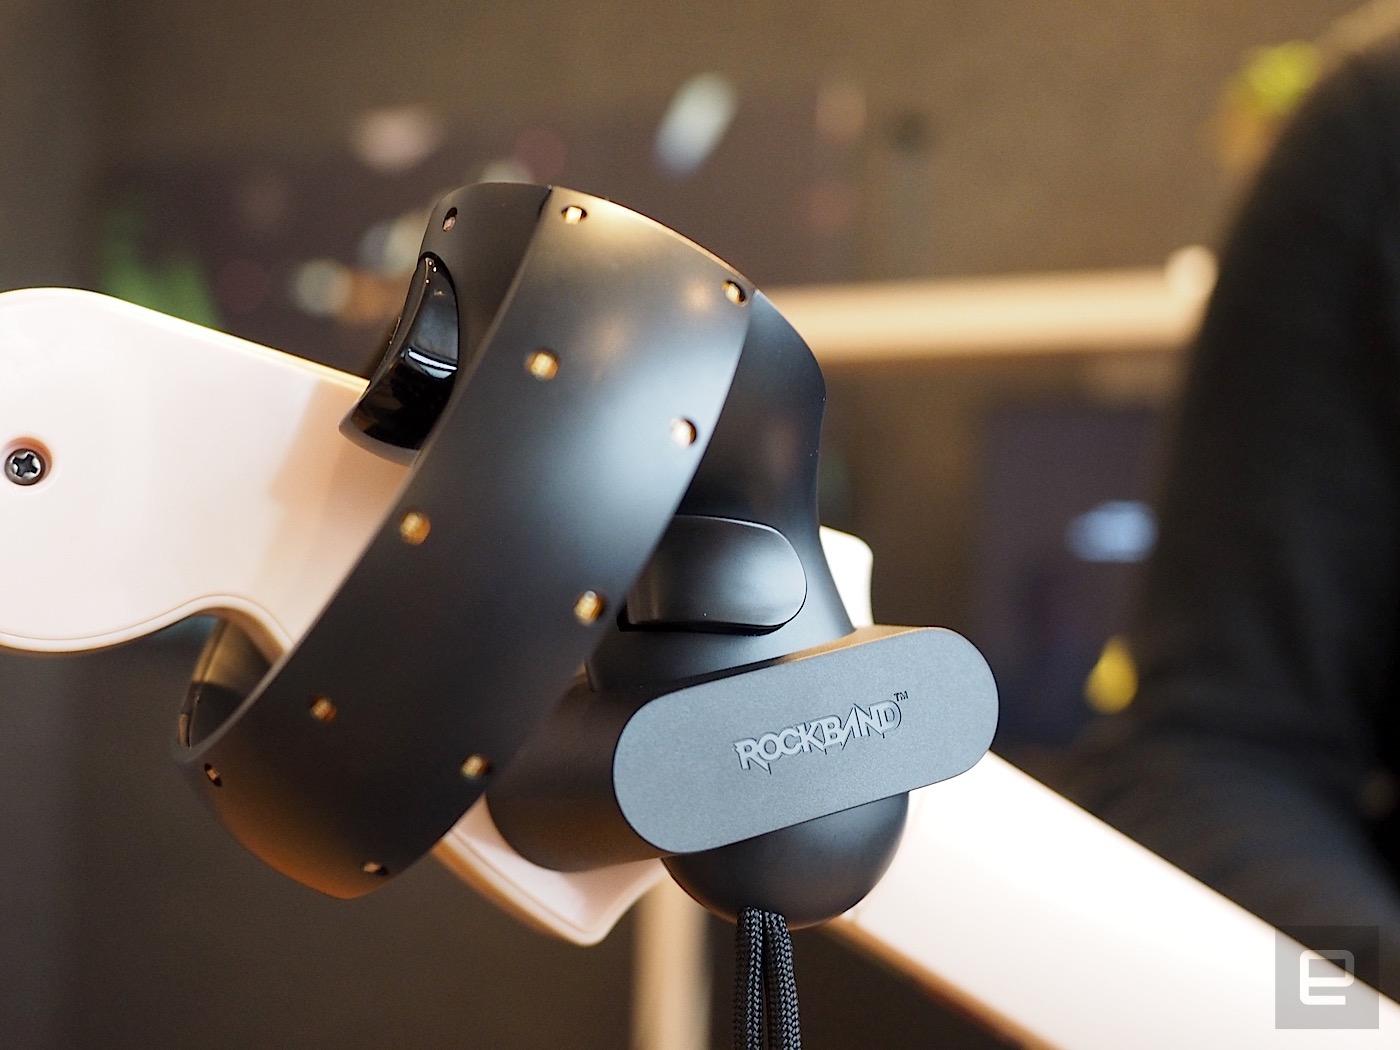 Rockband Oculus uplaod VR